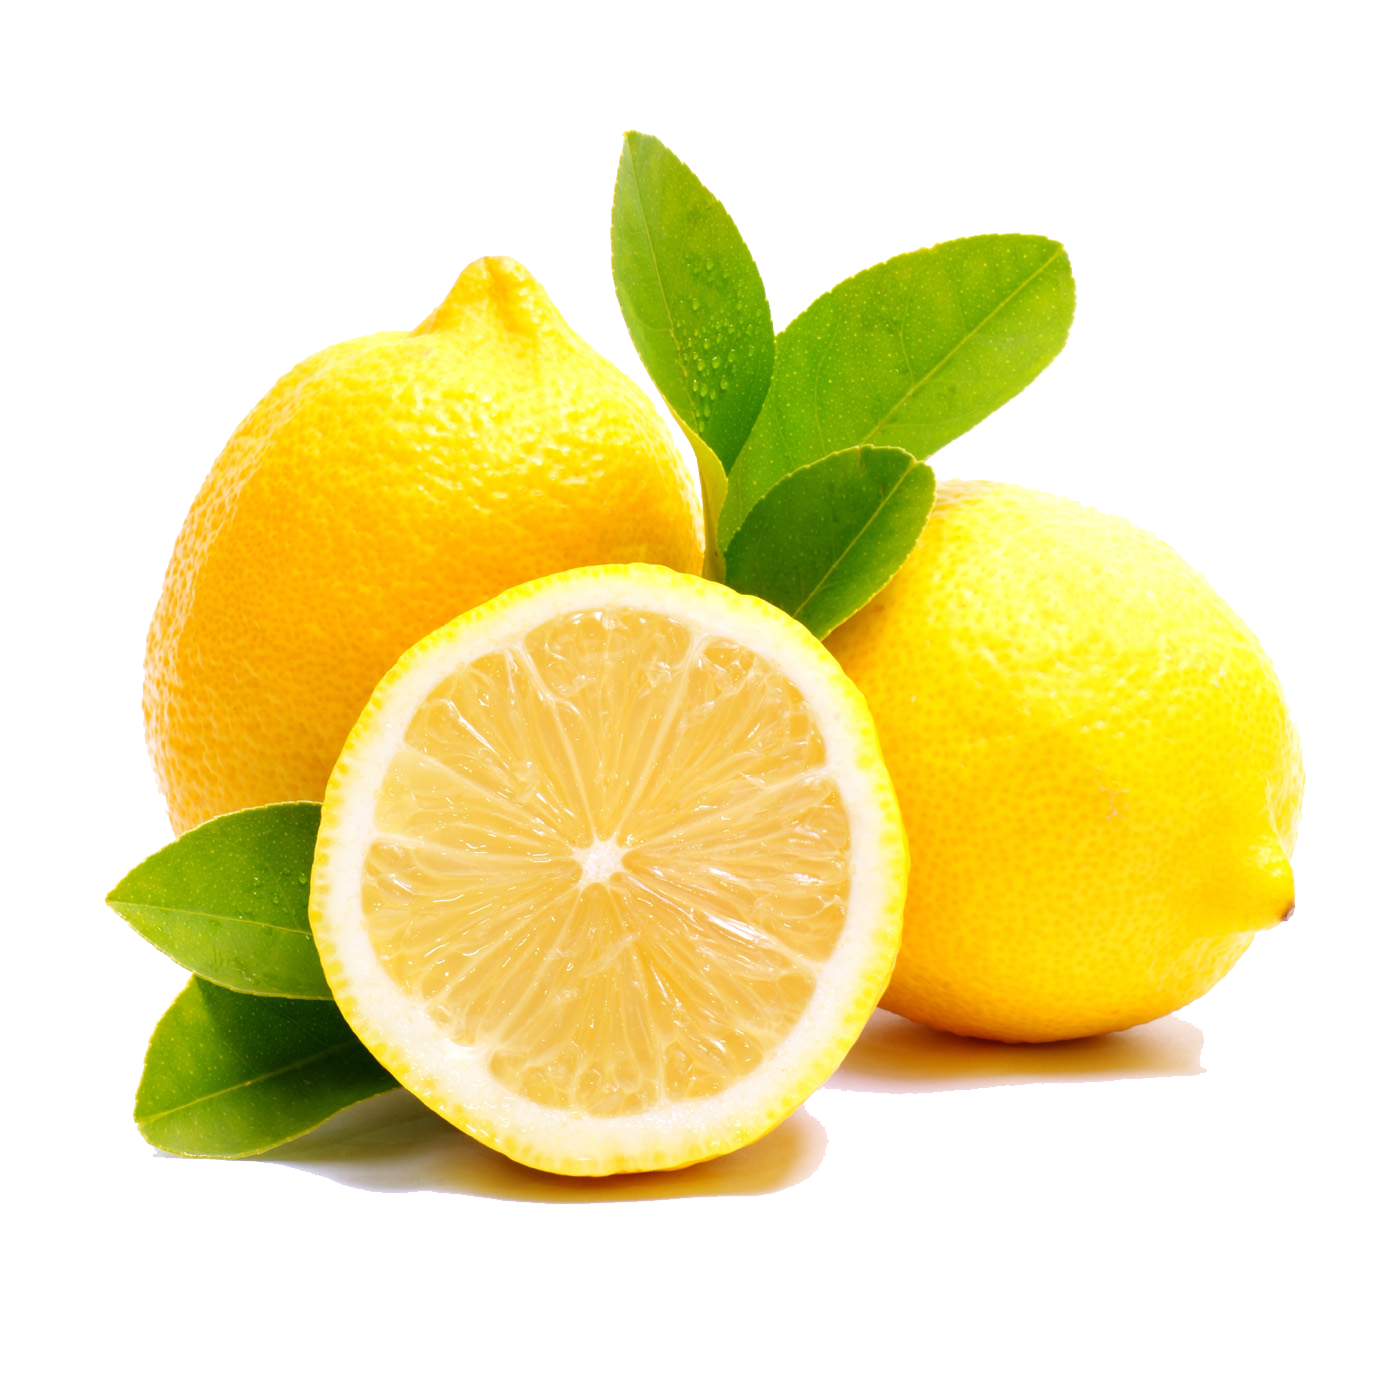 Download PNG image - Lemon Png Image - Lime HD PNG